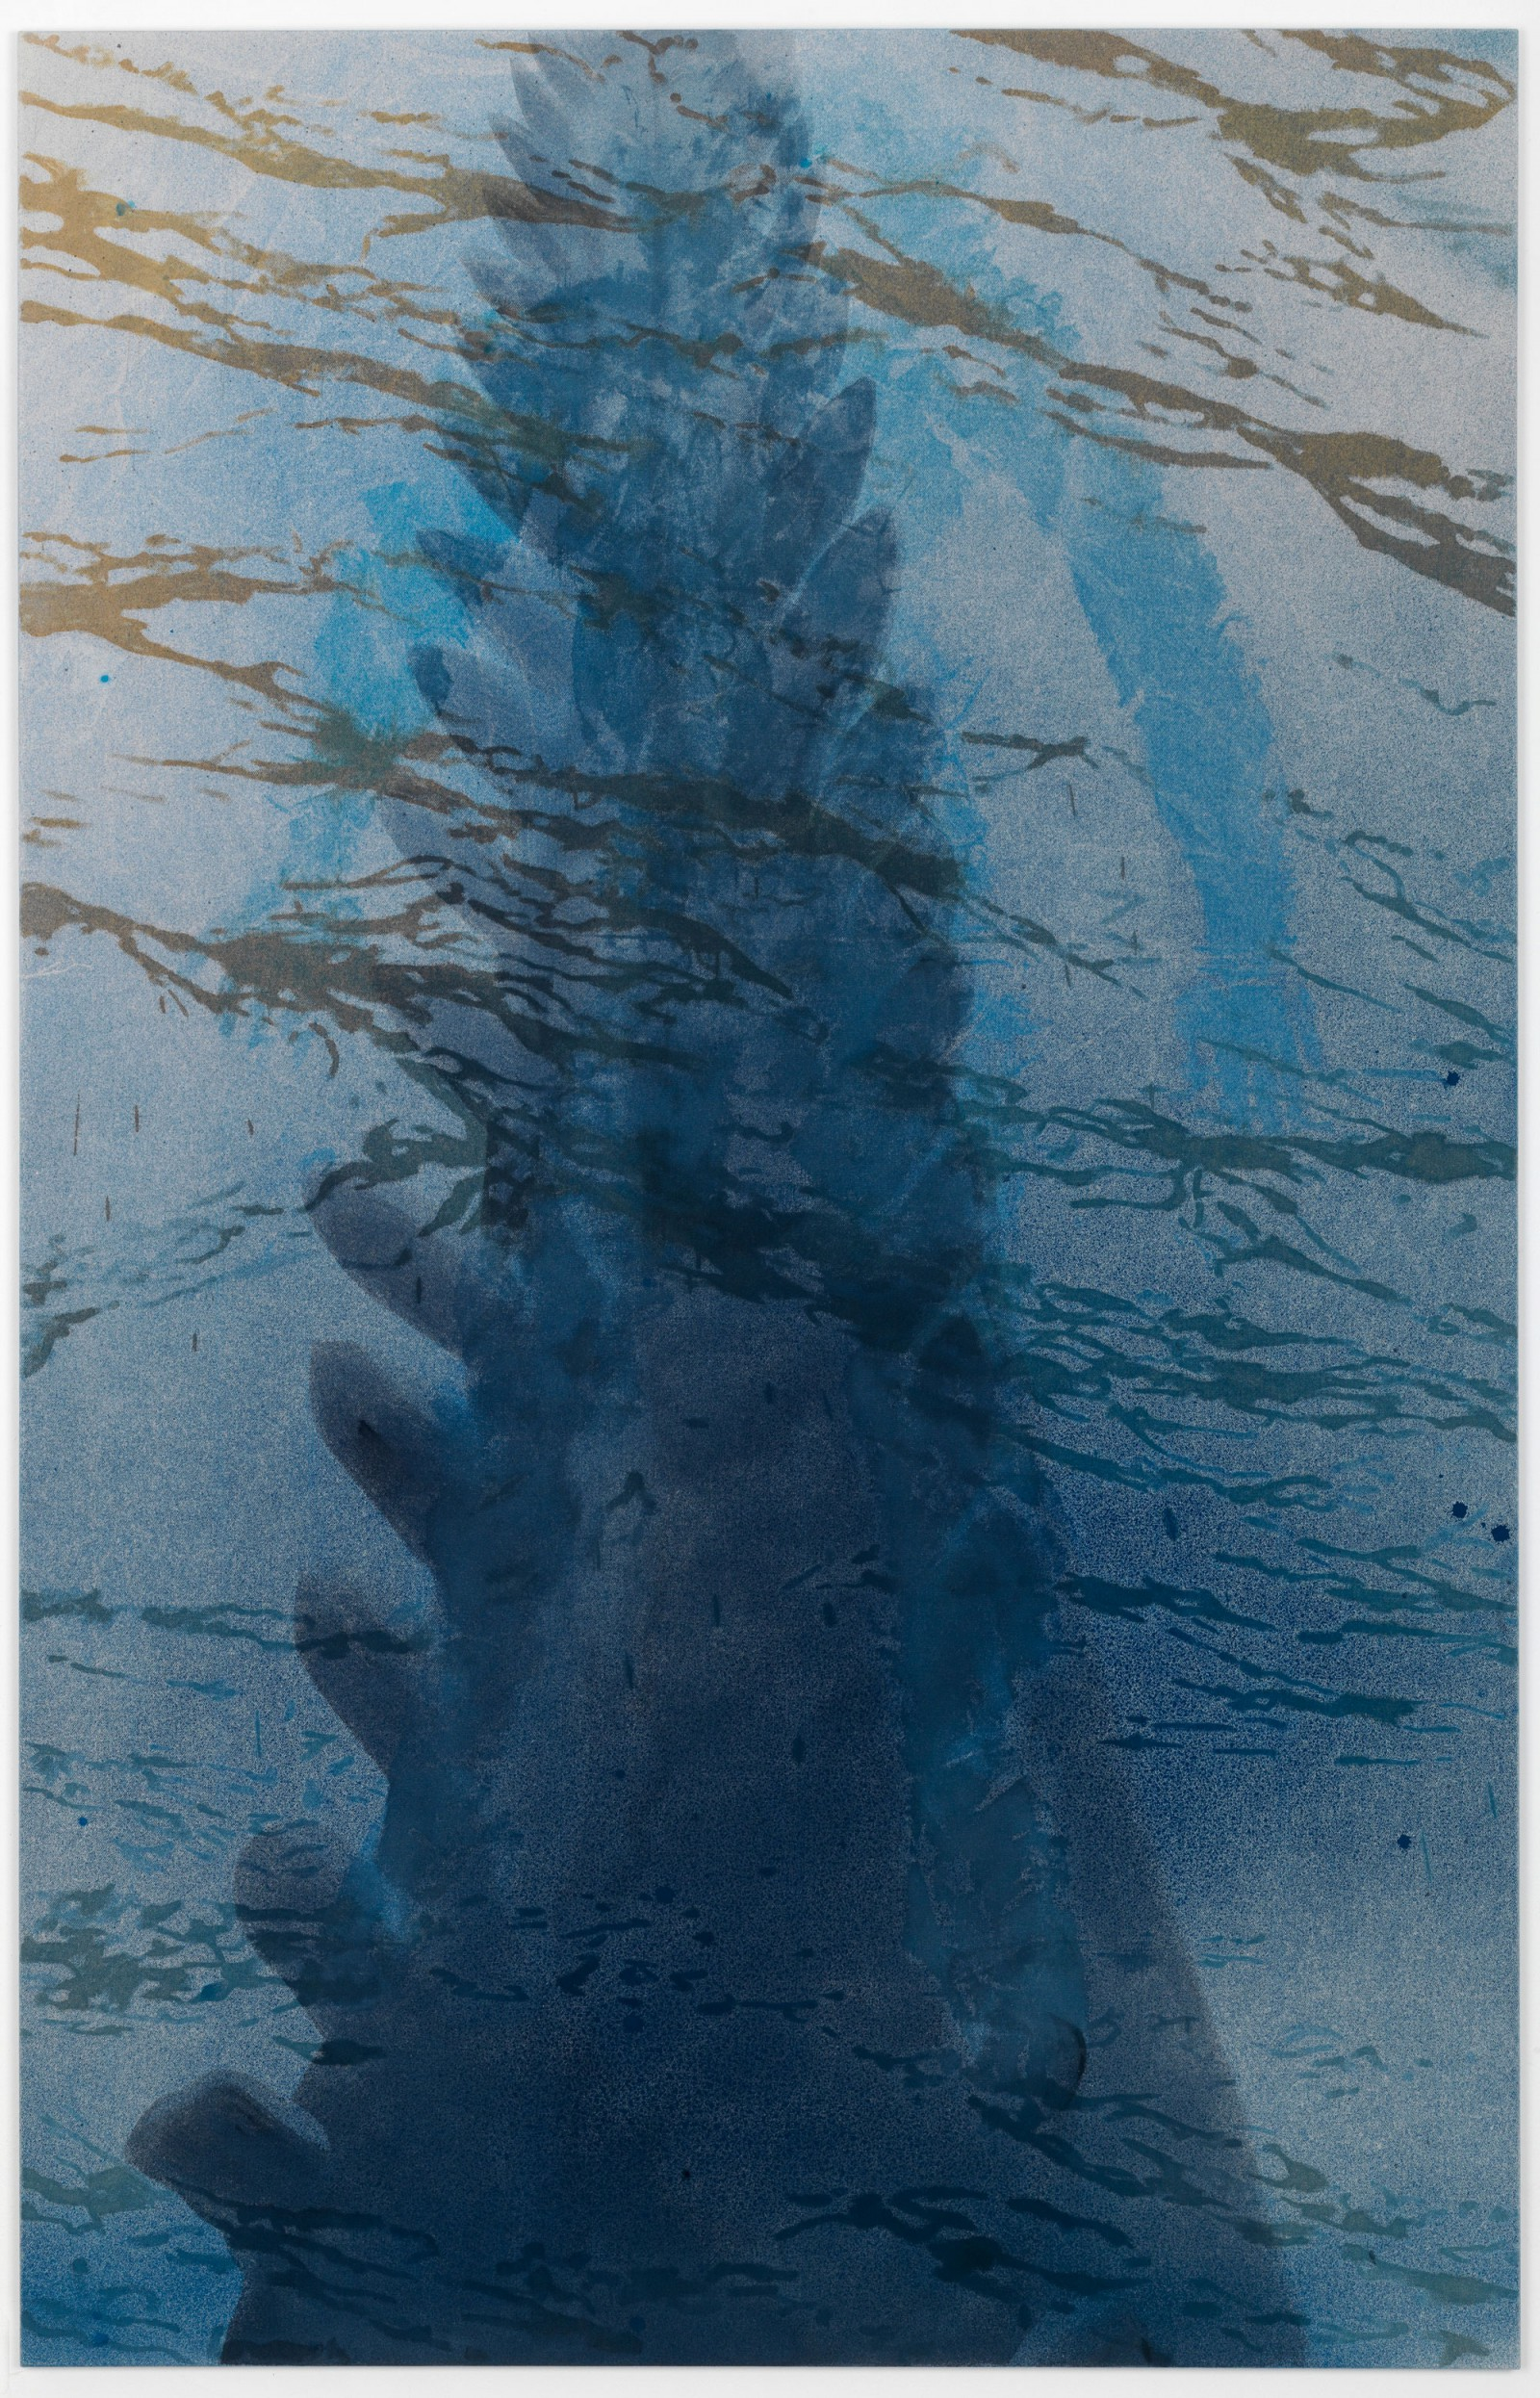 Kim Nekarda: ketos, 2010, vinyl color, poppy oil & body print on cotton, 210 x 140 cm, private collection, lingen